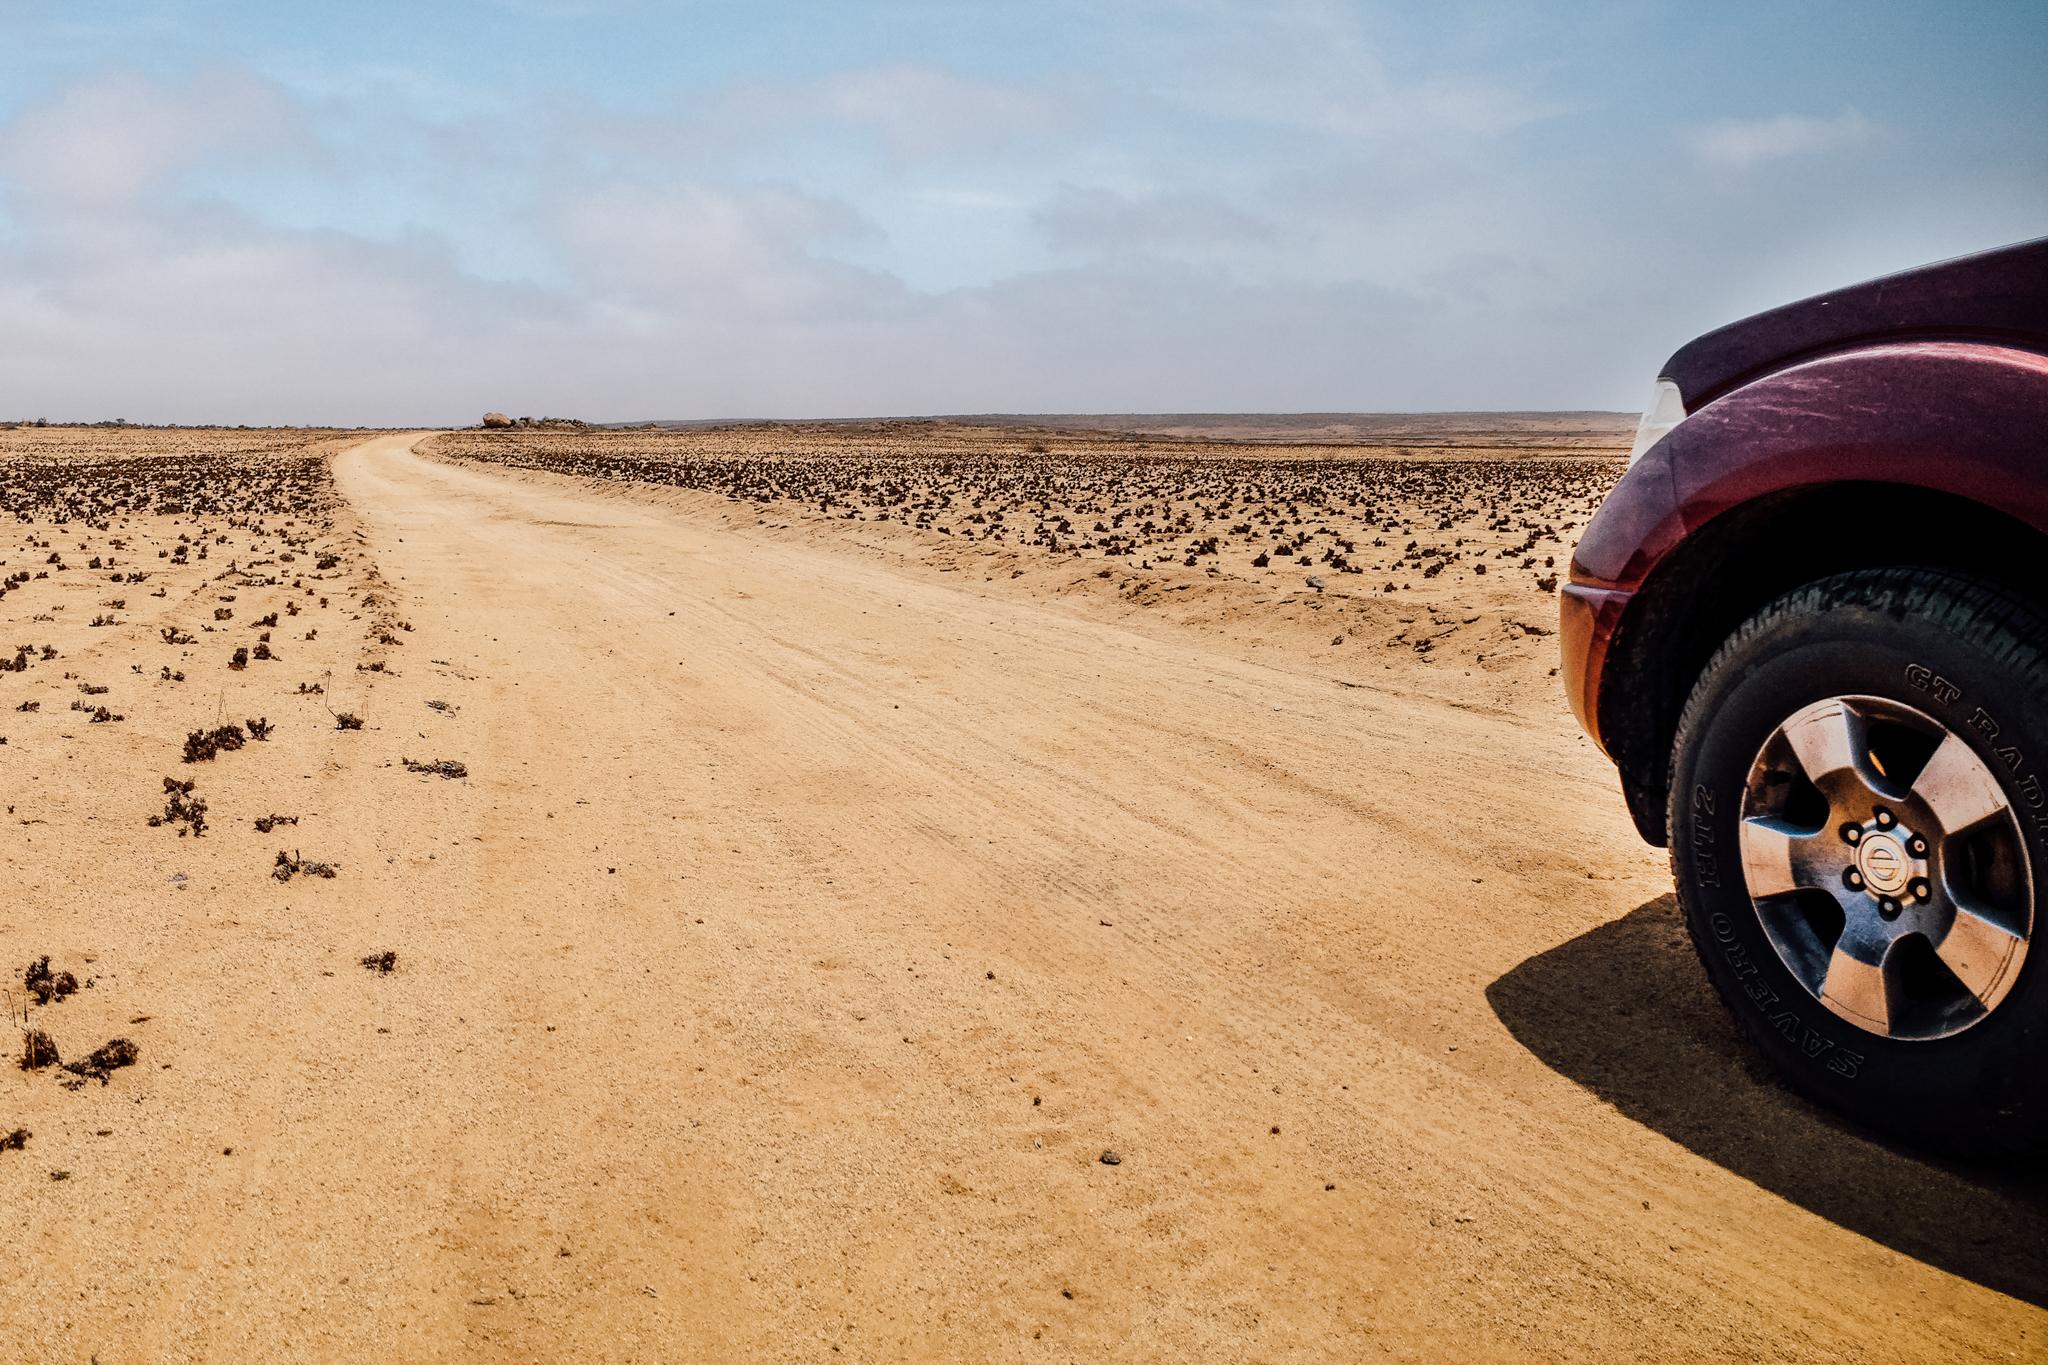 [2014] iPhone 4S - Namine desert, Angola